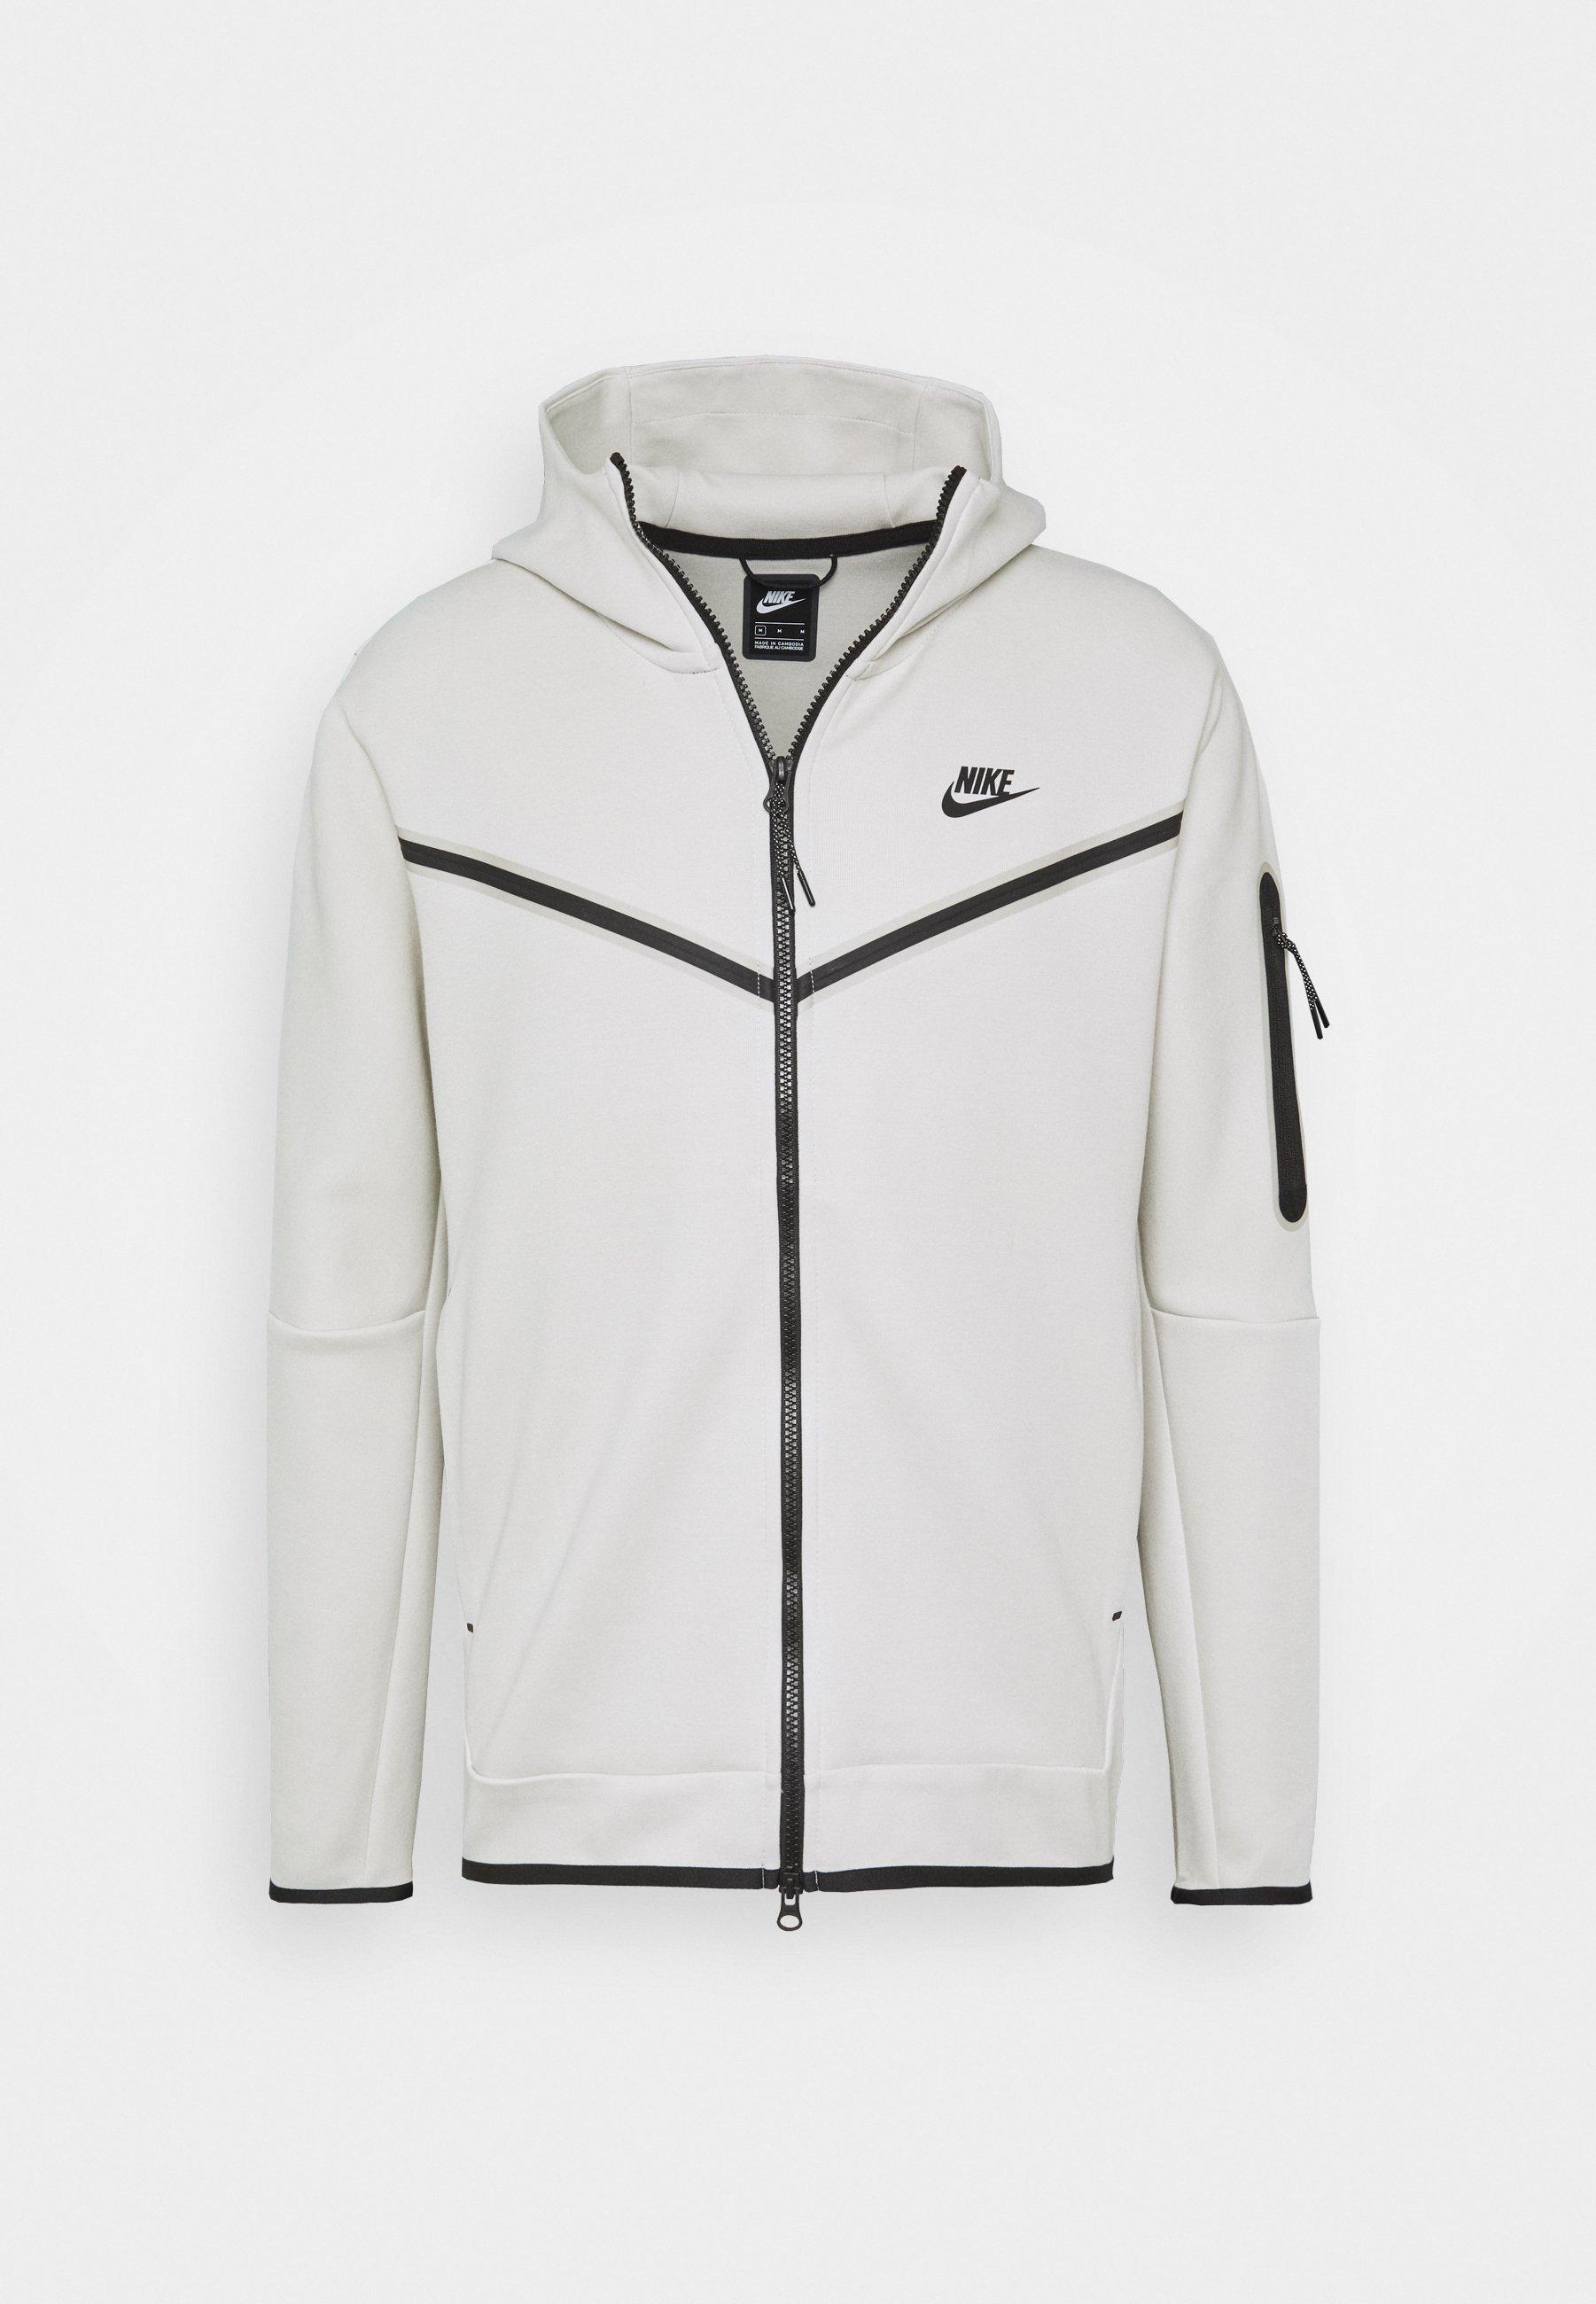 veste en sweat zippée light boneblack